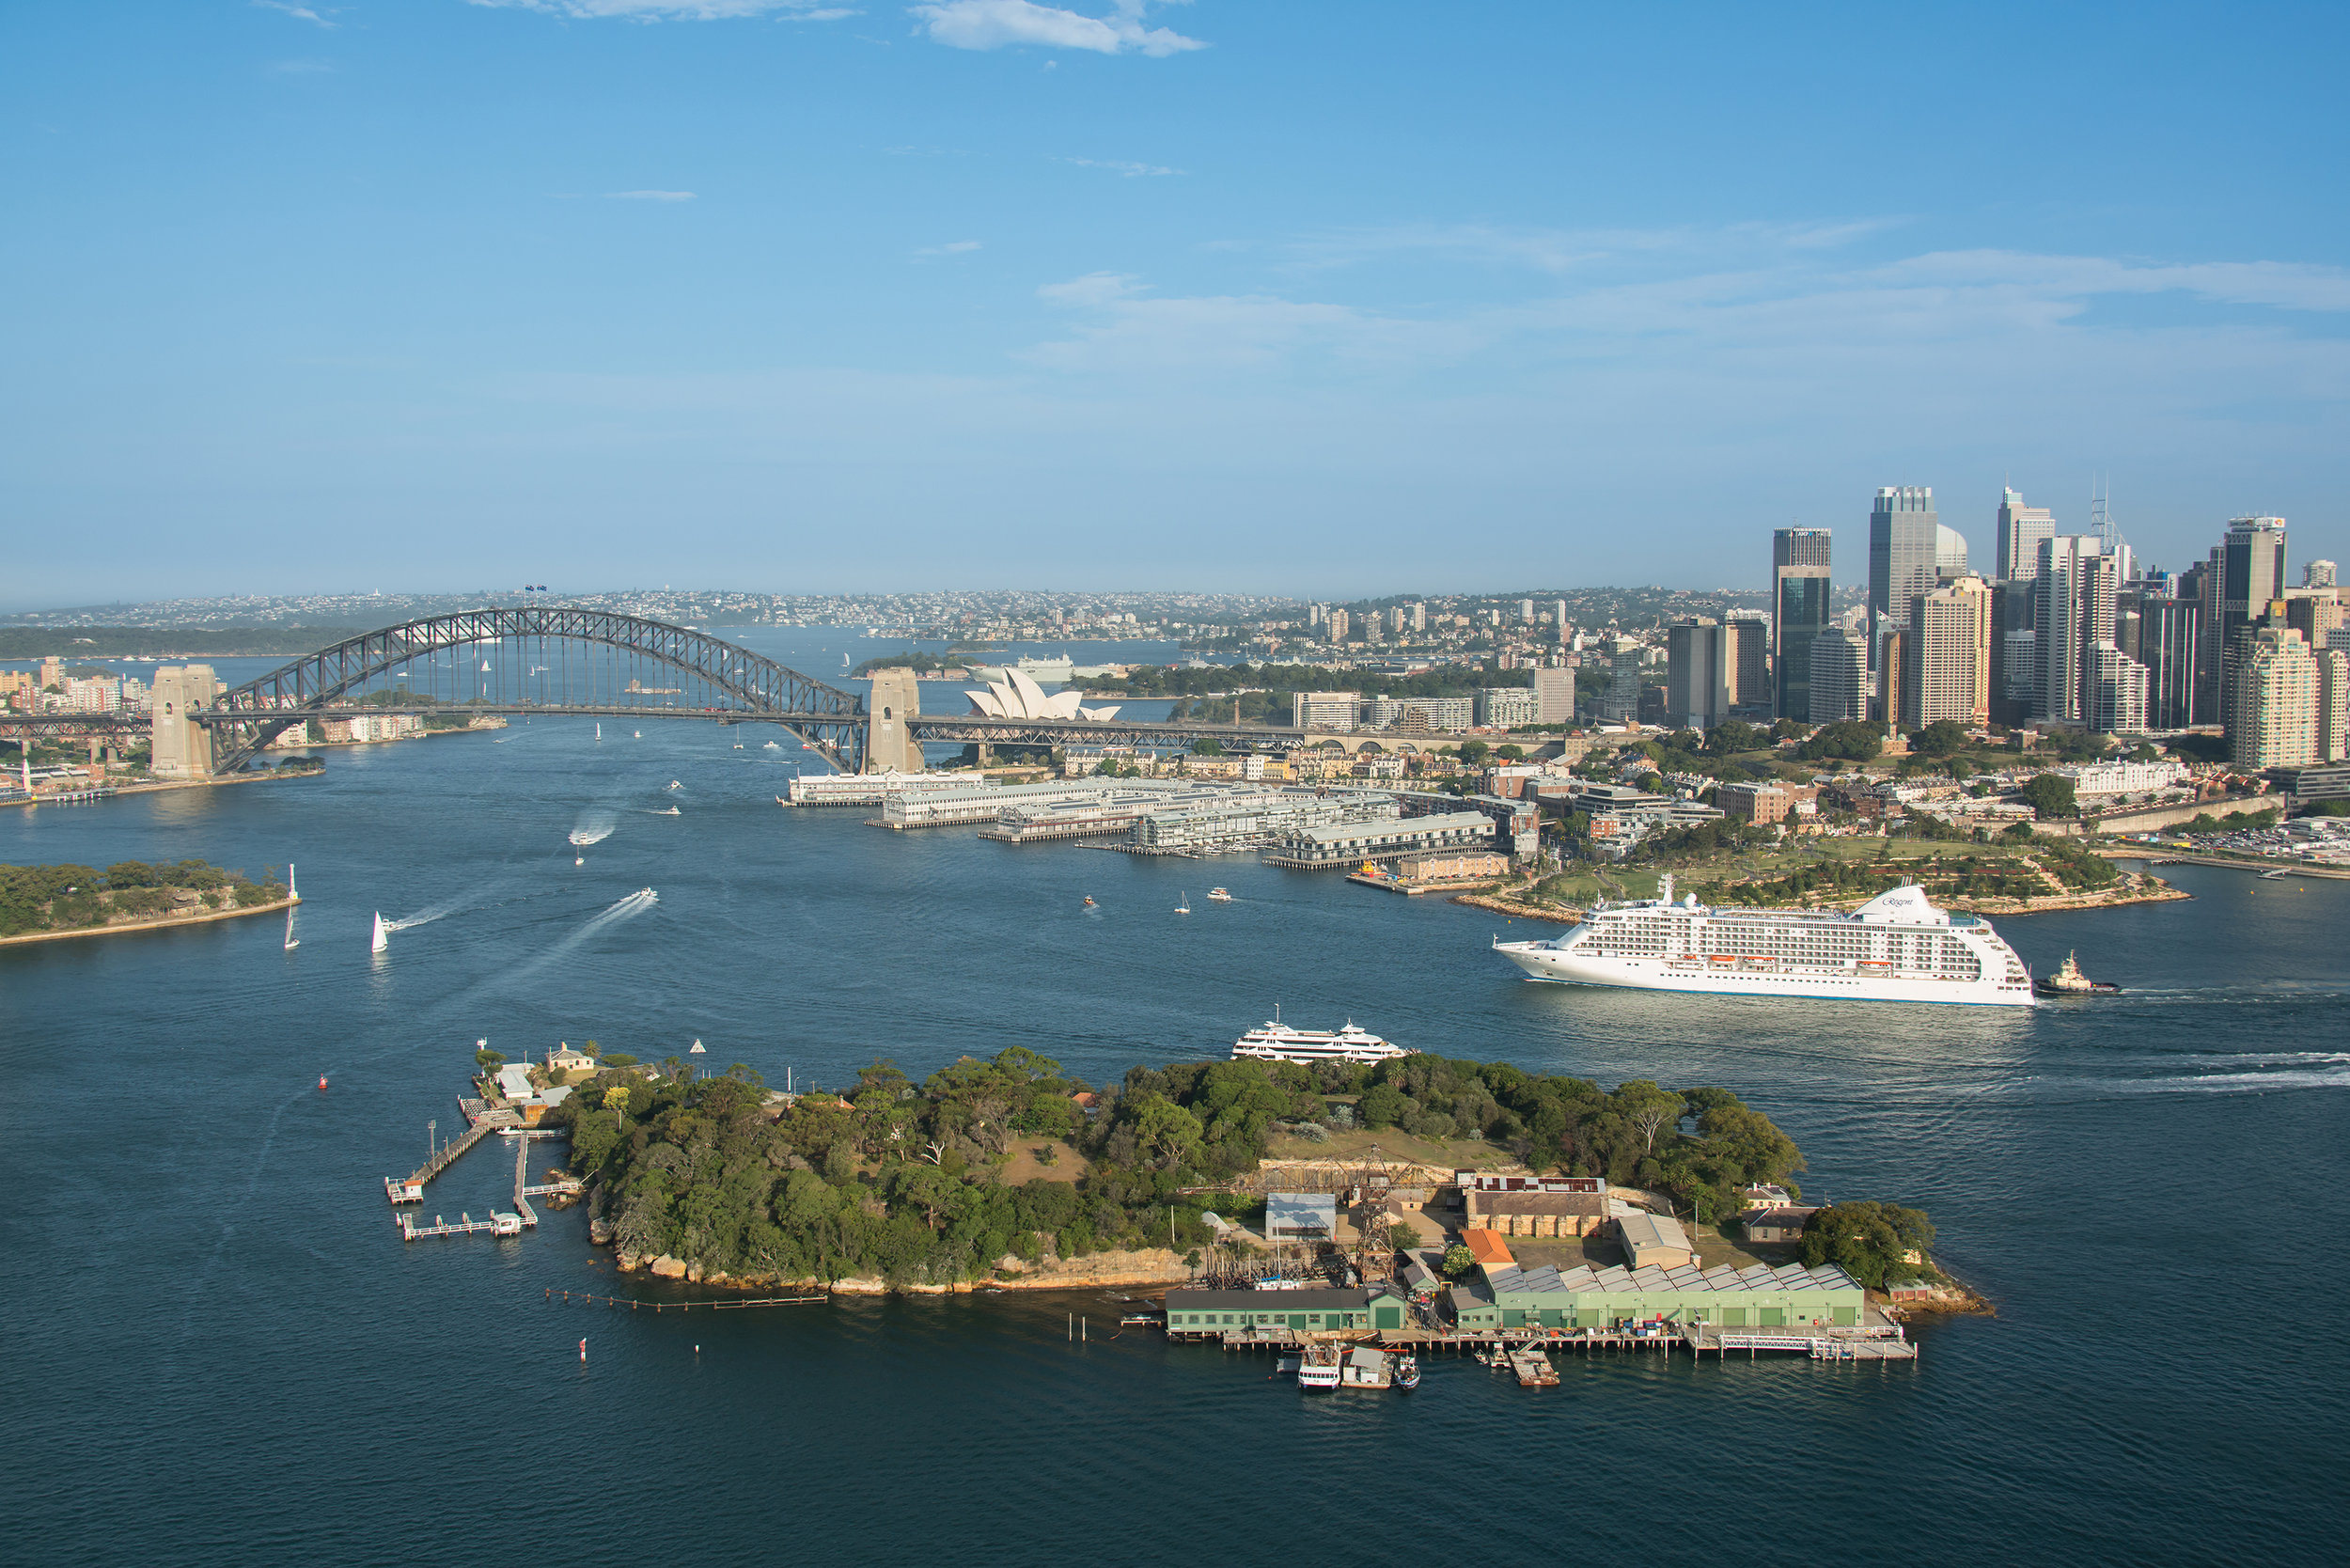 Regent Cruise Sydney Harbor